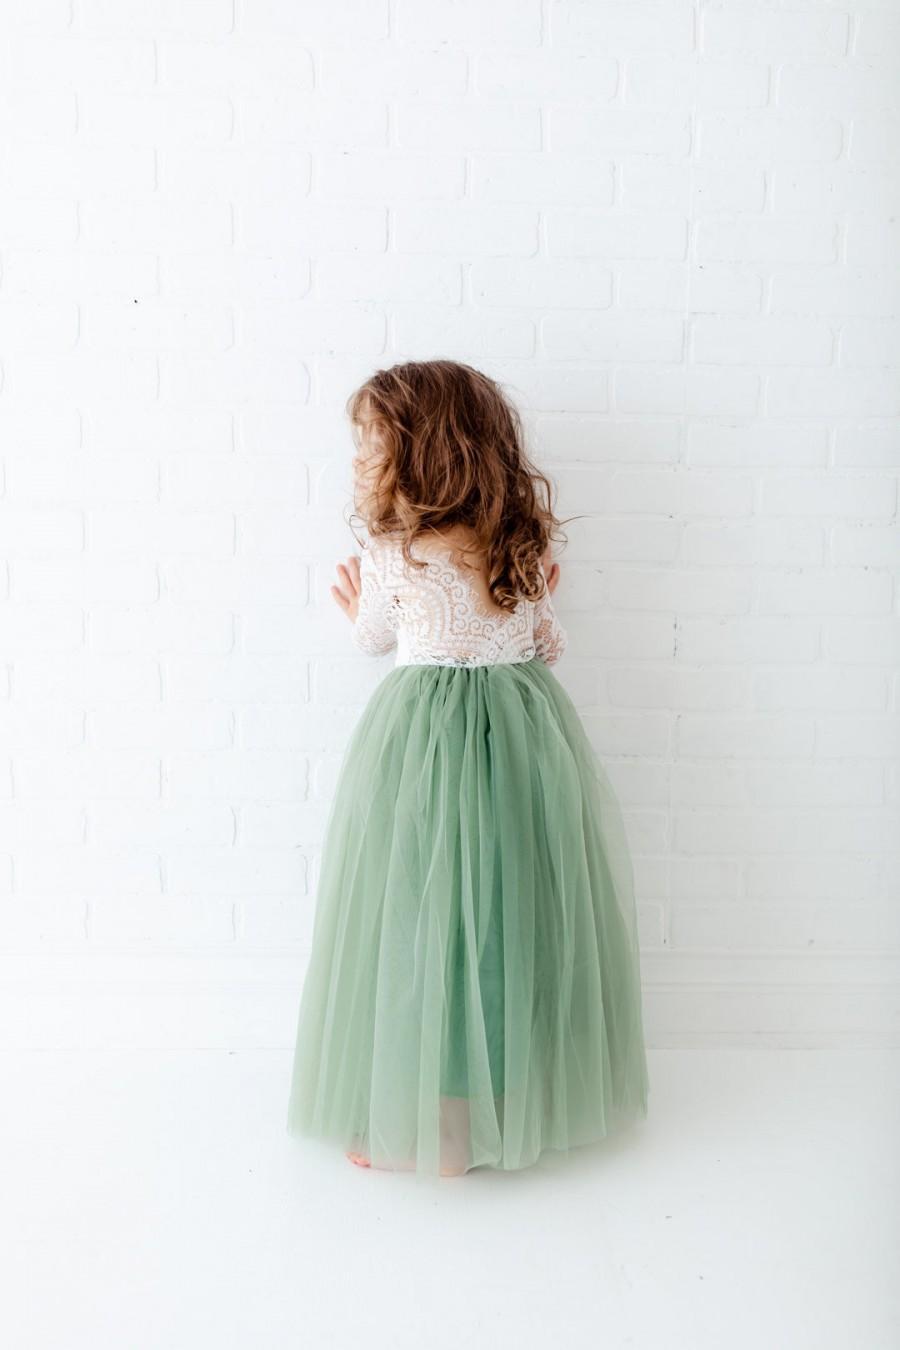 Wedding - Dusty Sage Long Sleeve Wedding Gown, White Lace Flower Girl Dress, Floor Length Mint Green Tulle Dress